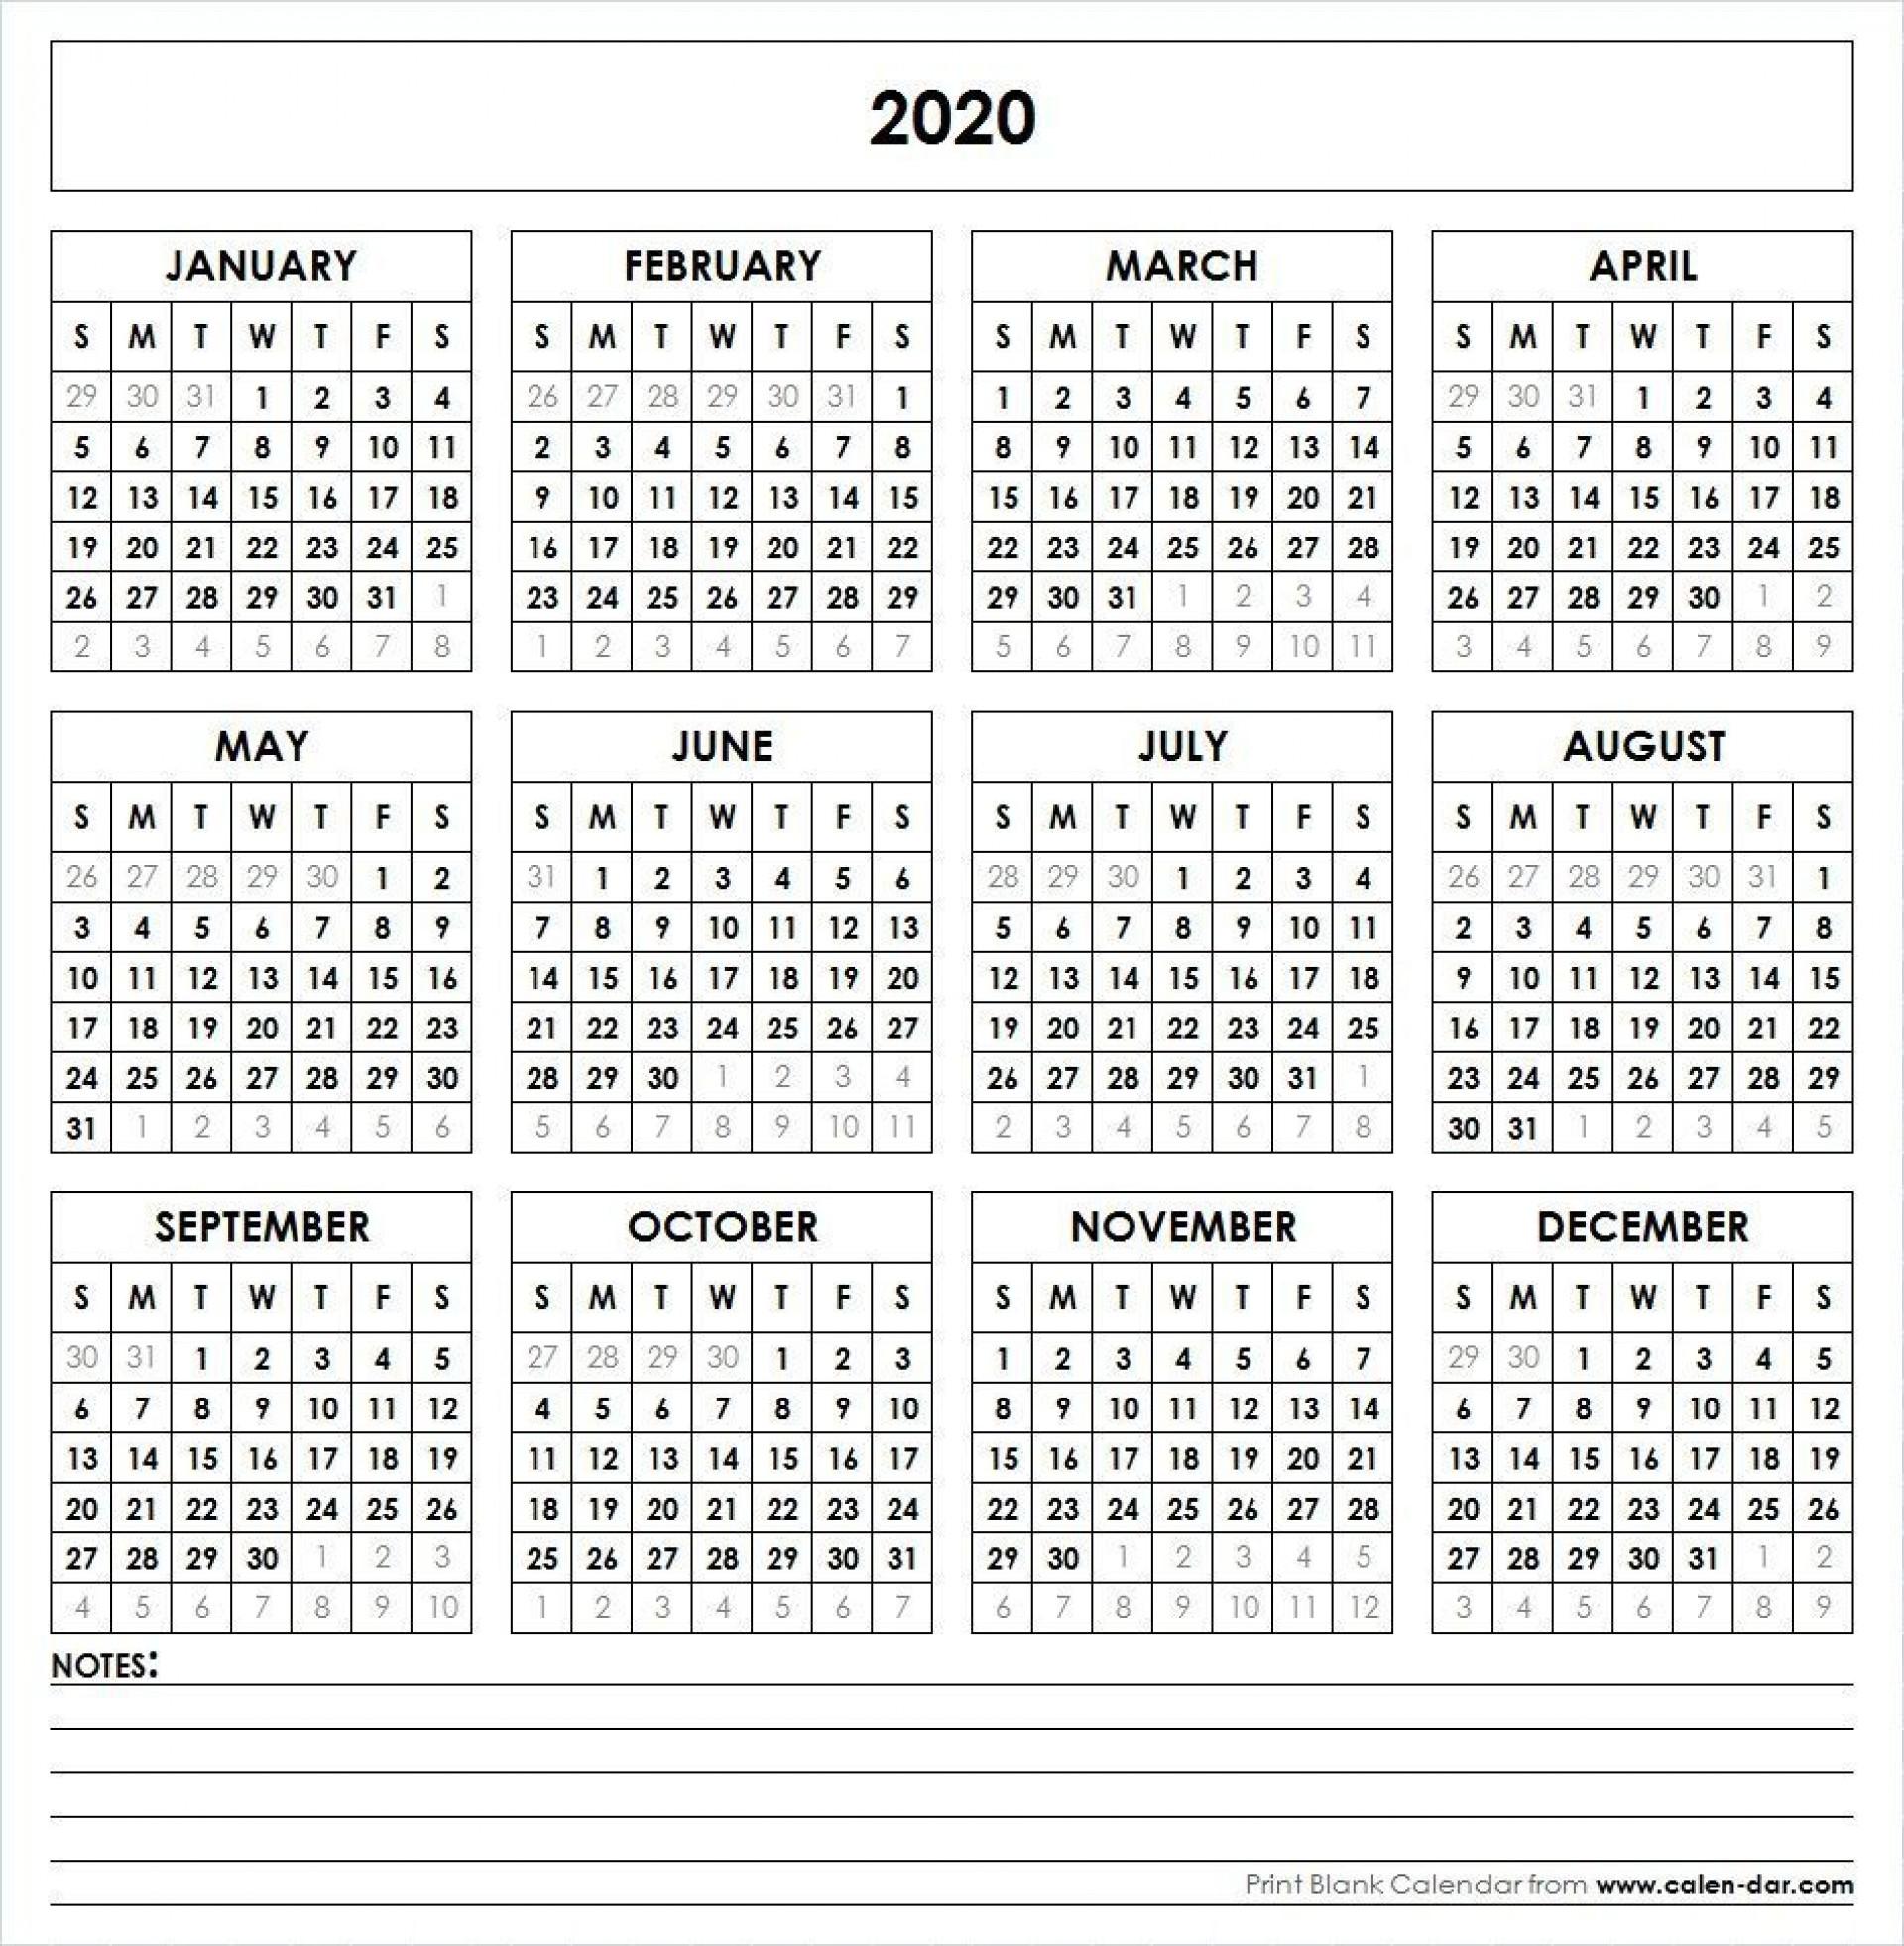 002 Simple 2020 Payroll Calendar Template Sample  Biweekly Canada Free Excel1920